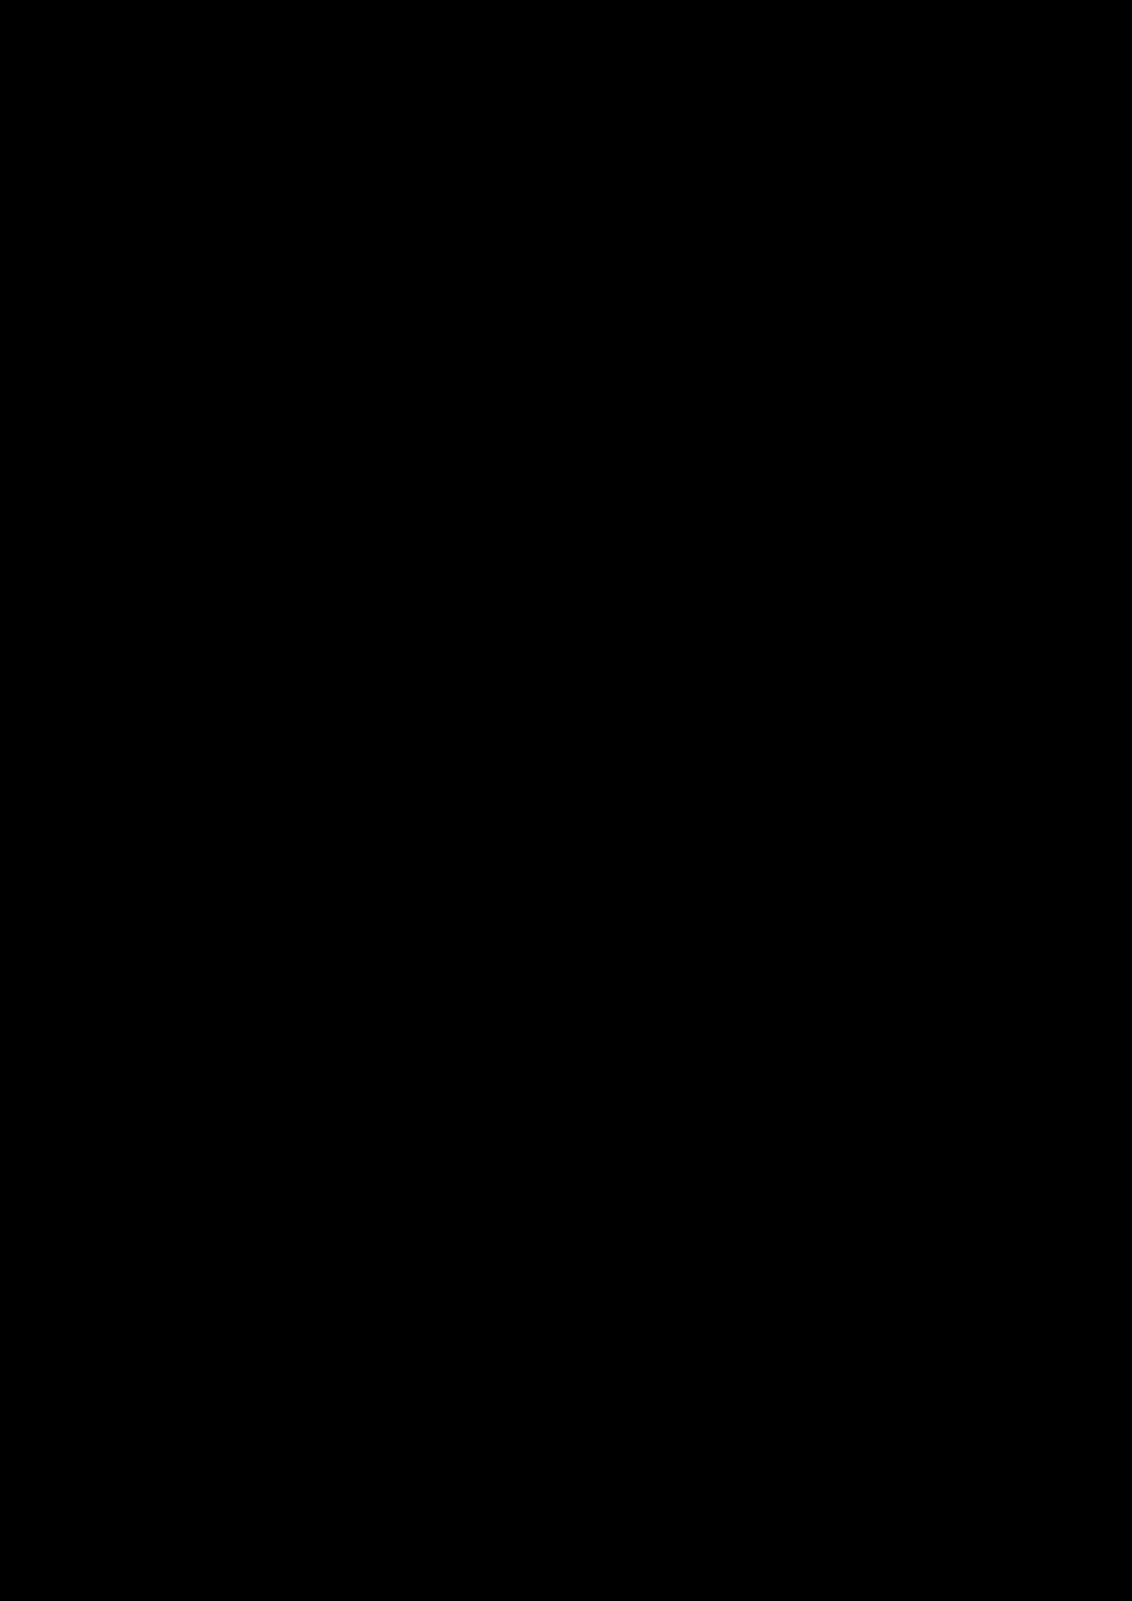 Belyiy sokol slide, Image 15